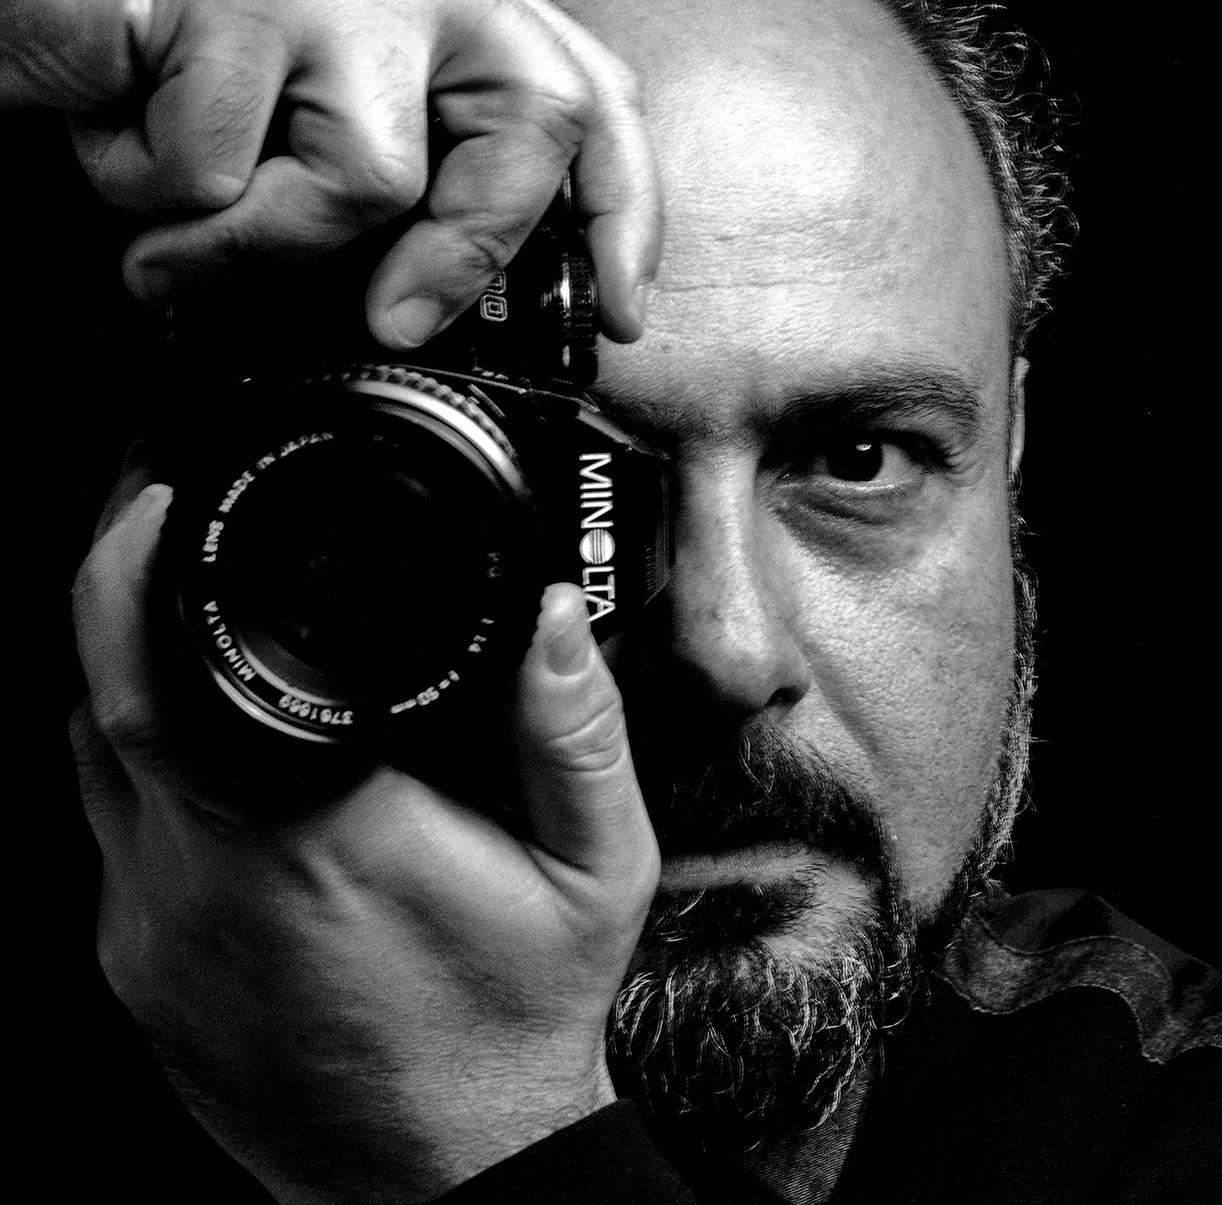 b7c83cc9ec Ένας Καβαλιώτης φωτογράφος «ταξιδεύει» την Καβάλα μέχρι το... Μαϊάμι ...